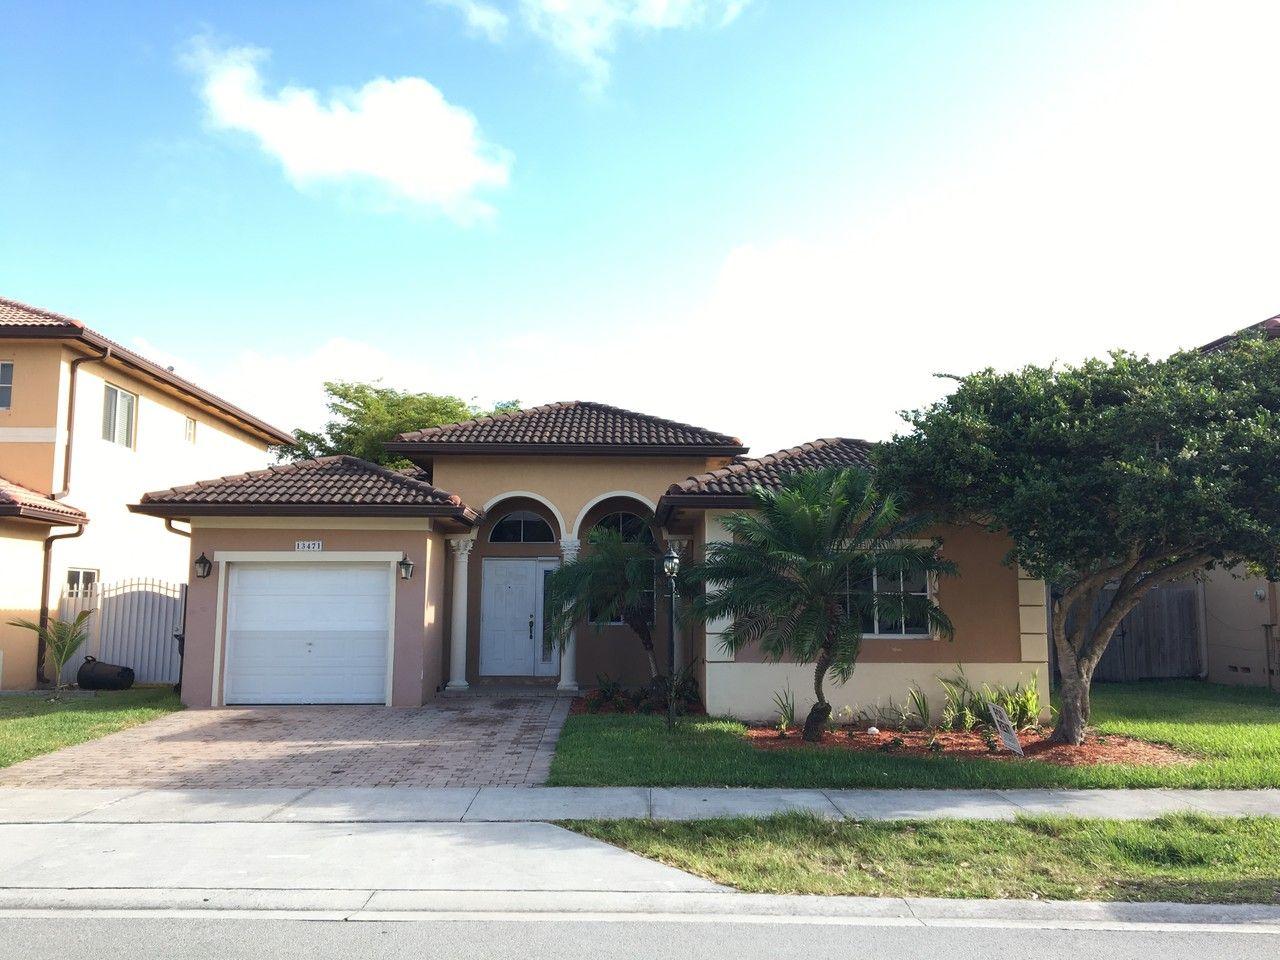 13471 Southwest 288th Terrace Homestead Fl 33033 4